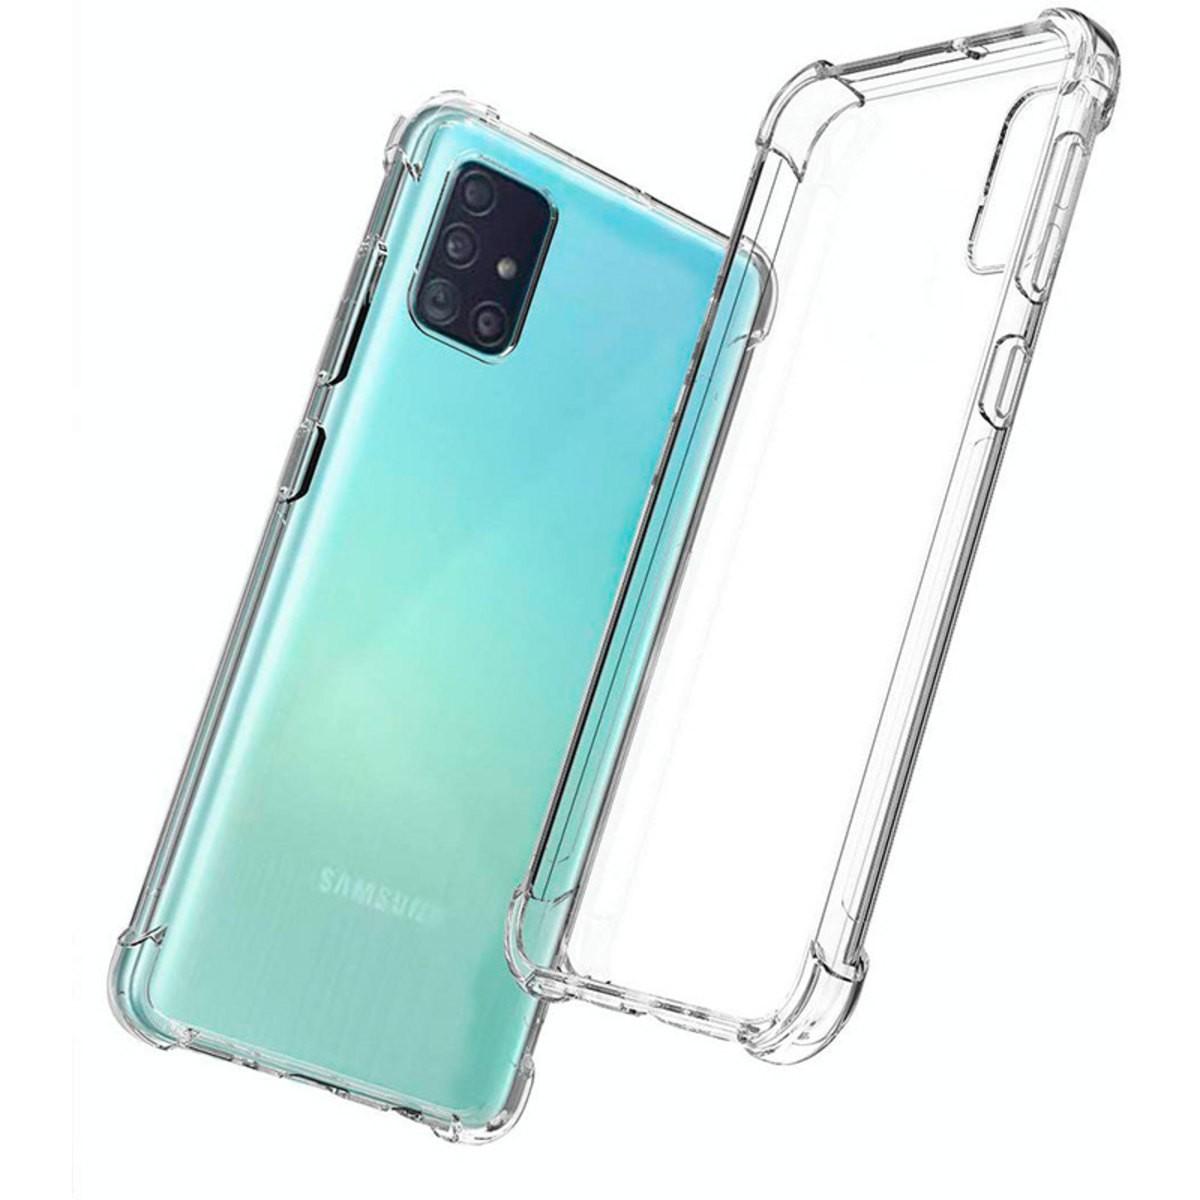 Capa Transparente Anti Shock Samsung Galaxy a51